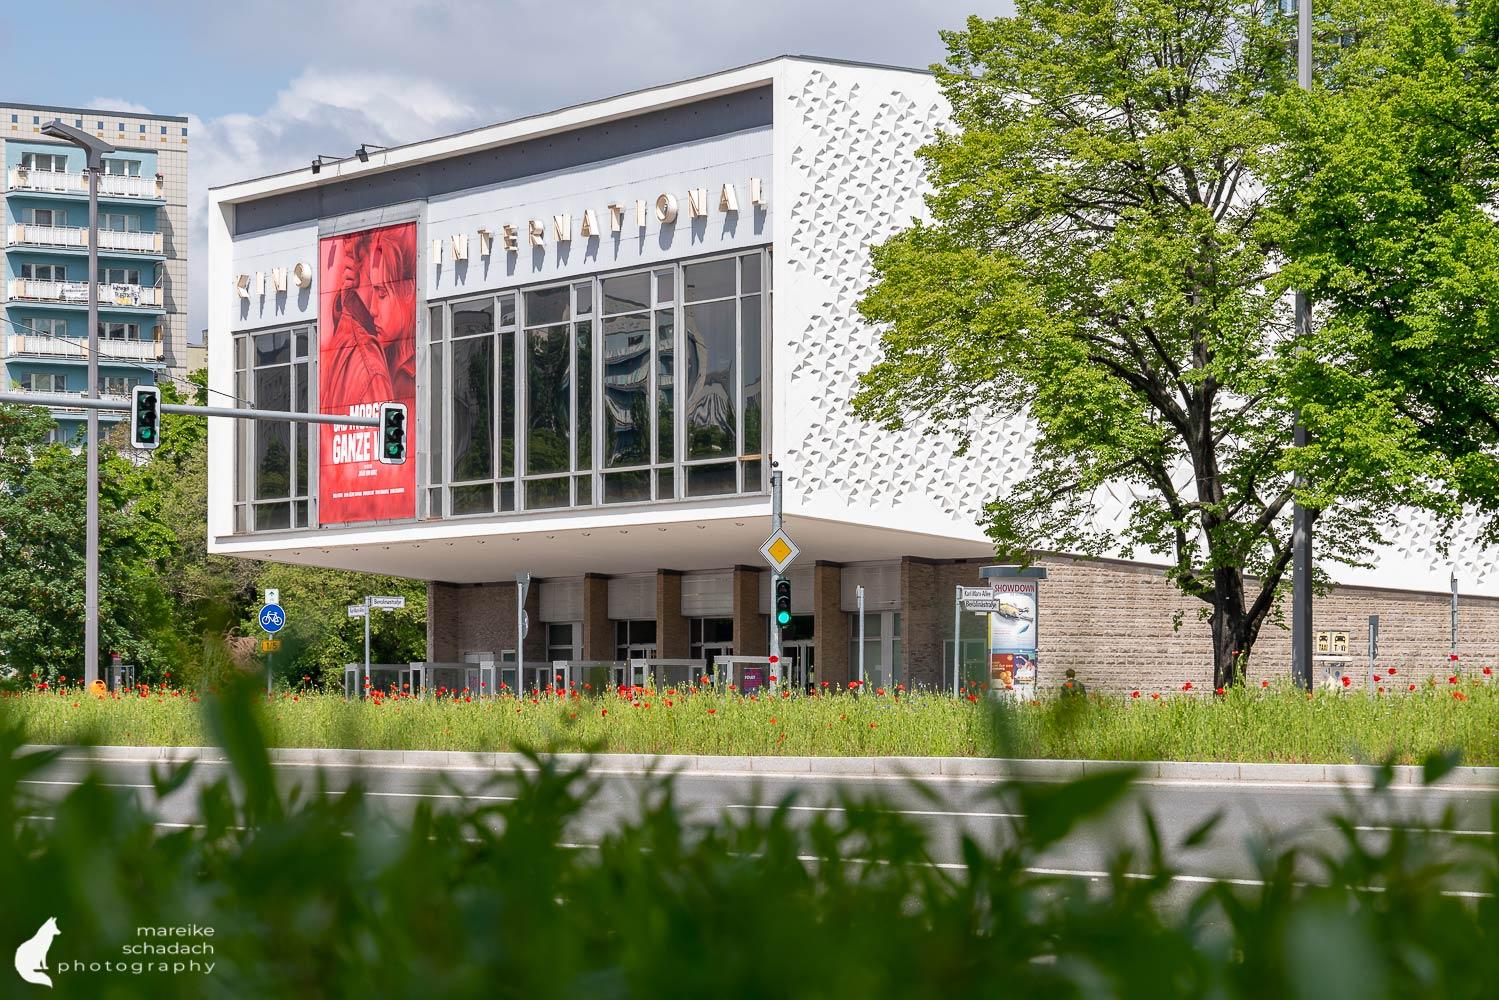 DDR Architektur in Berlin: Kino International